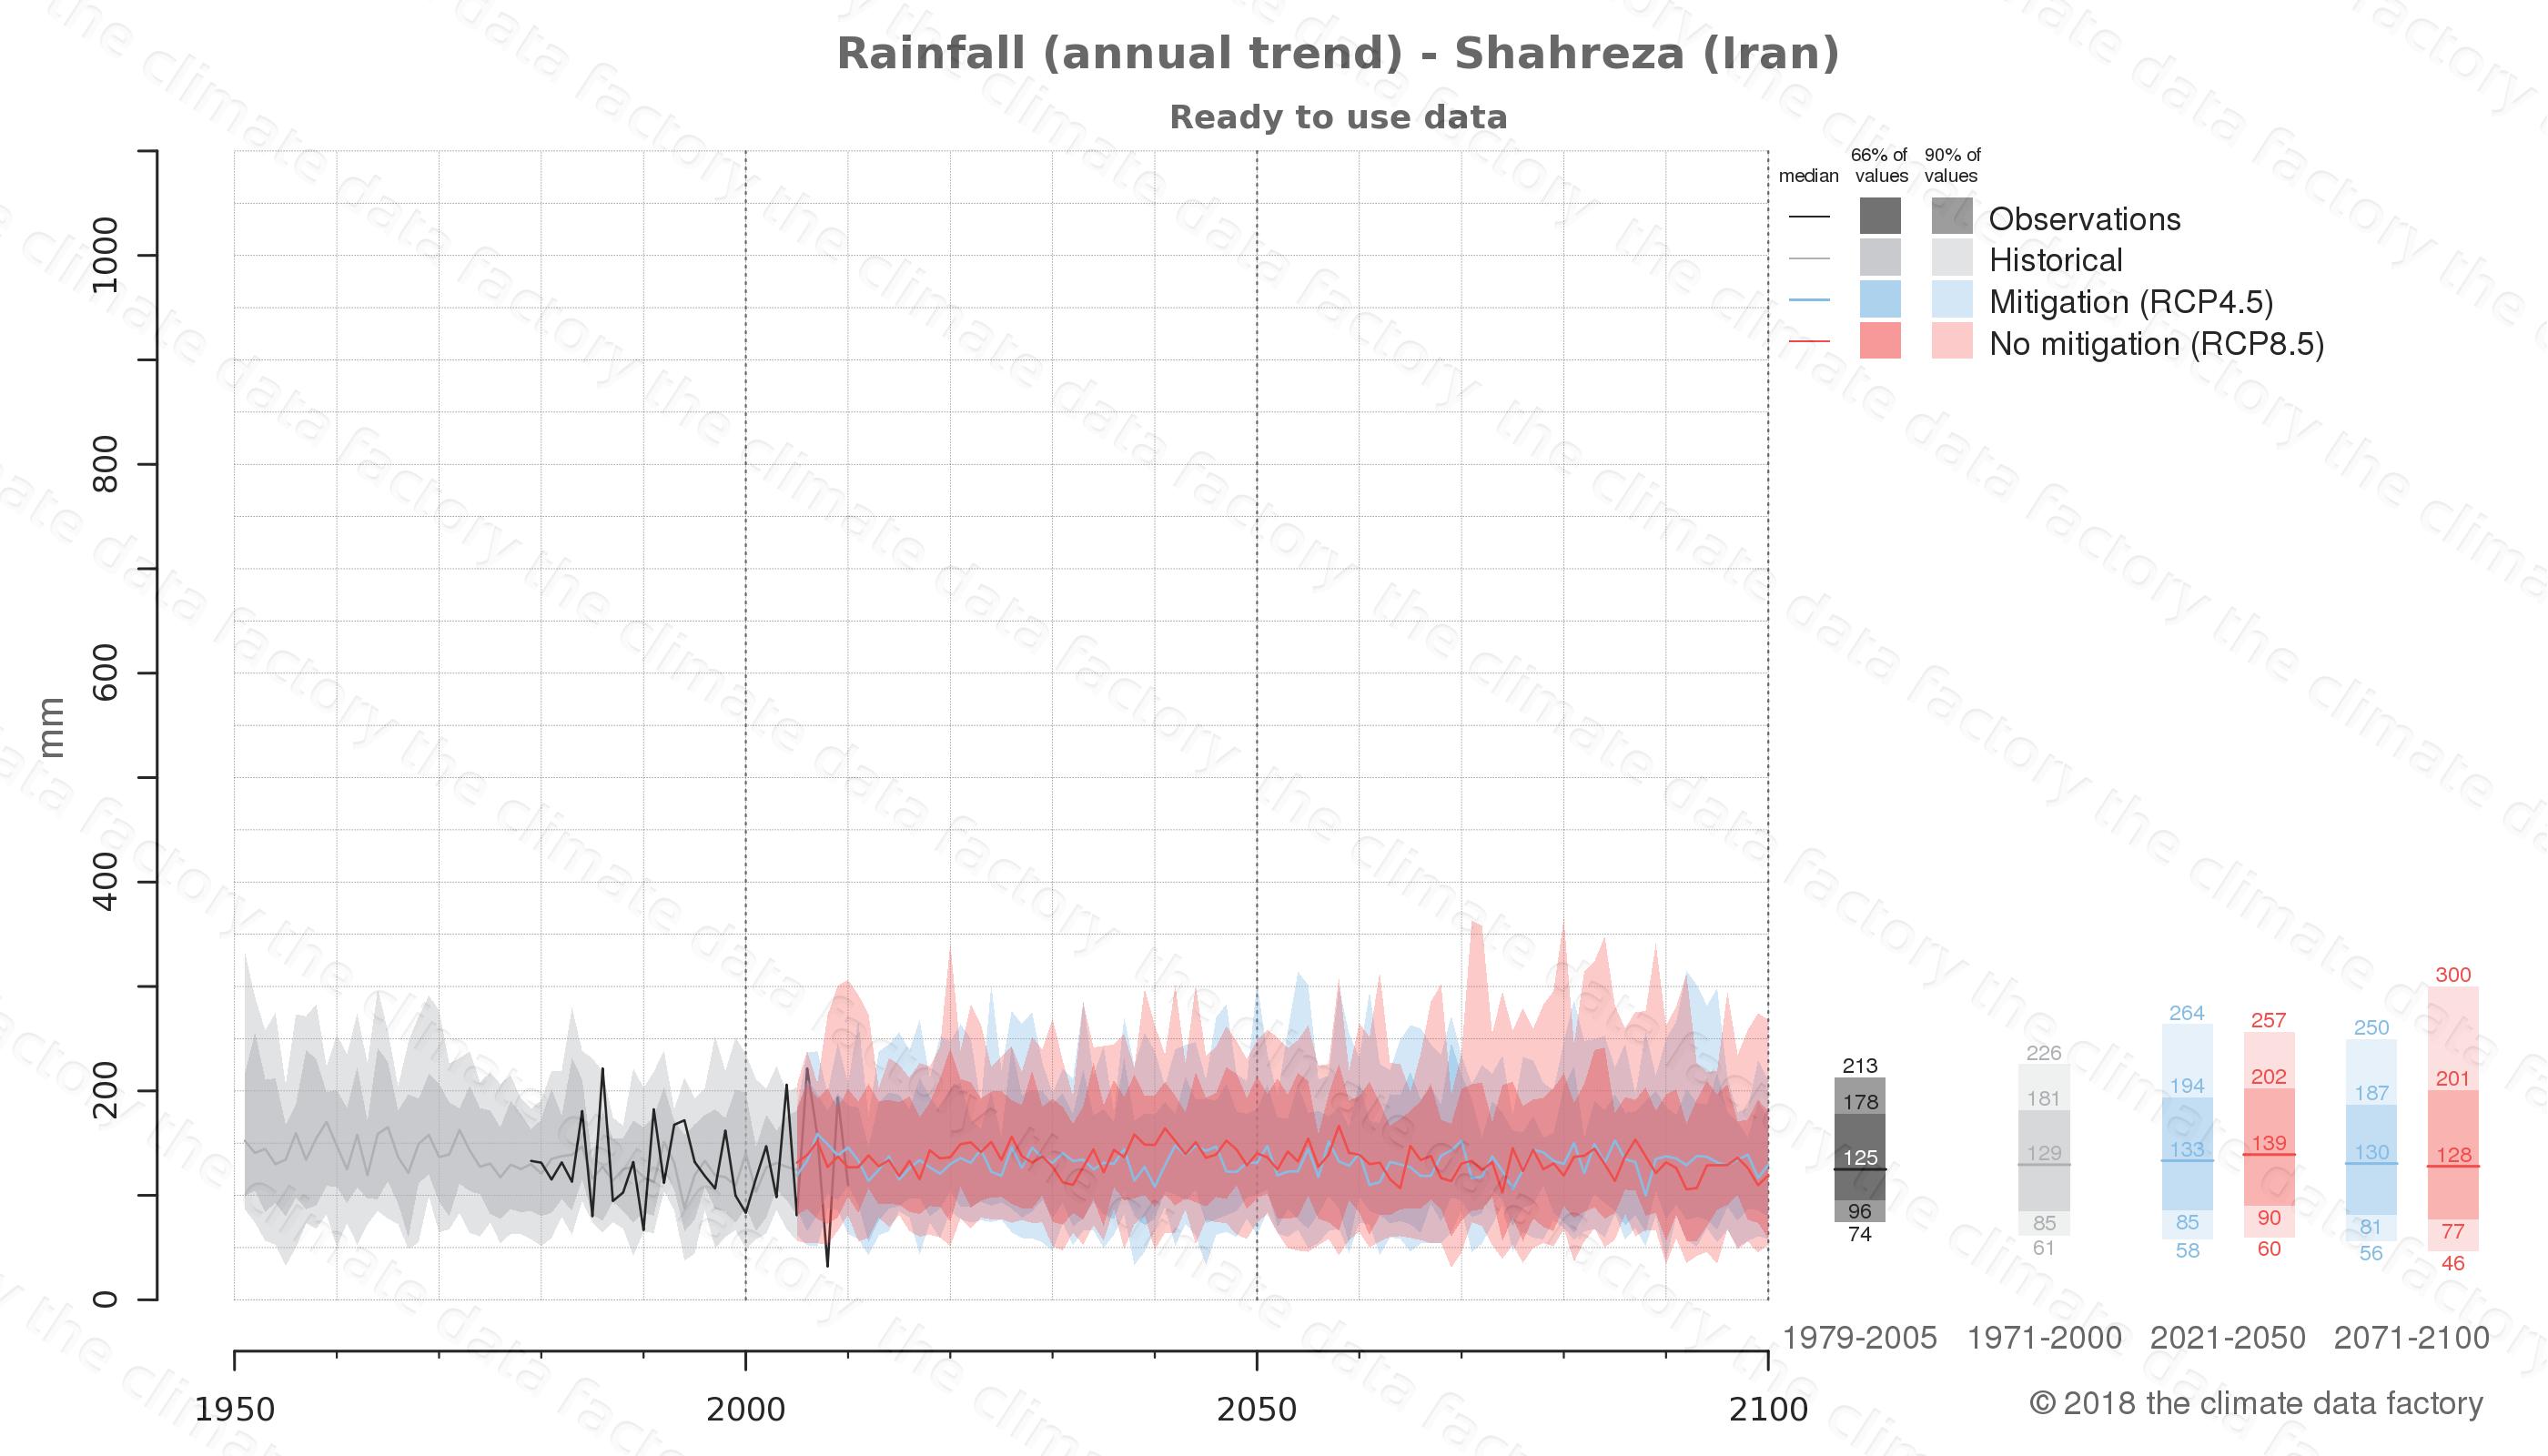 climate change data policy adaptation climate graph city data rainfall shahreza iran